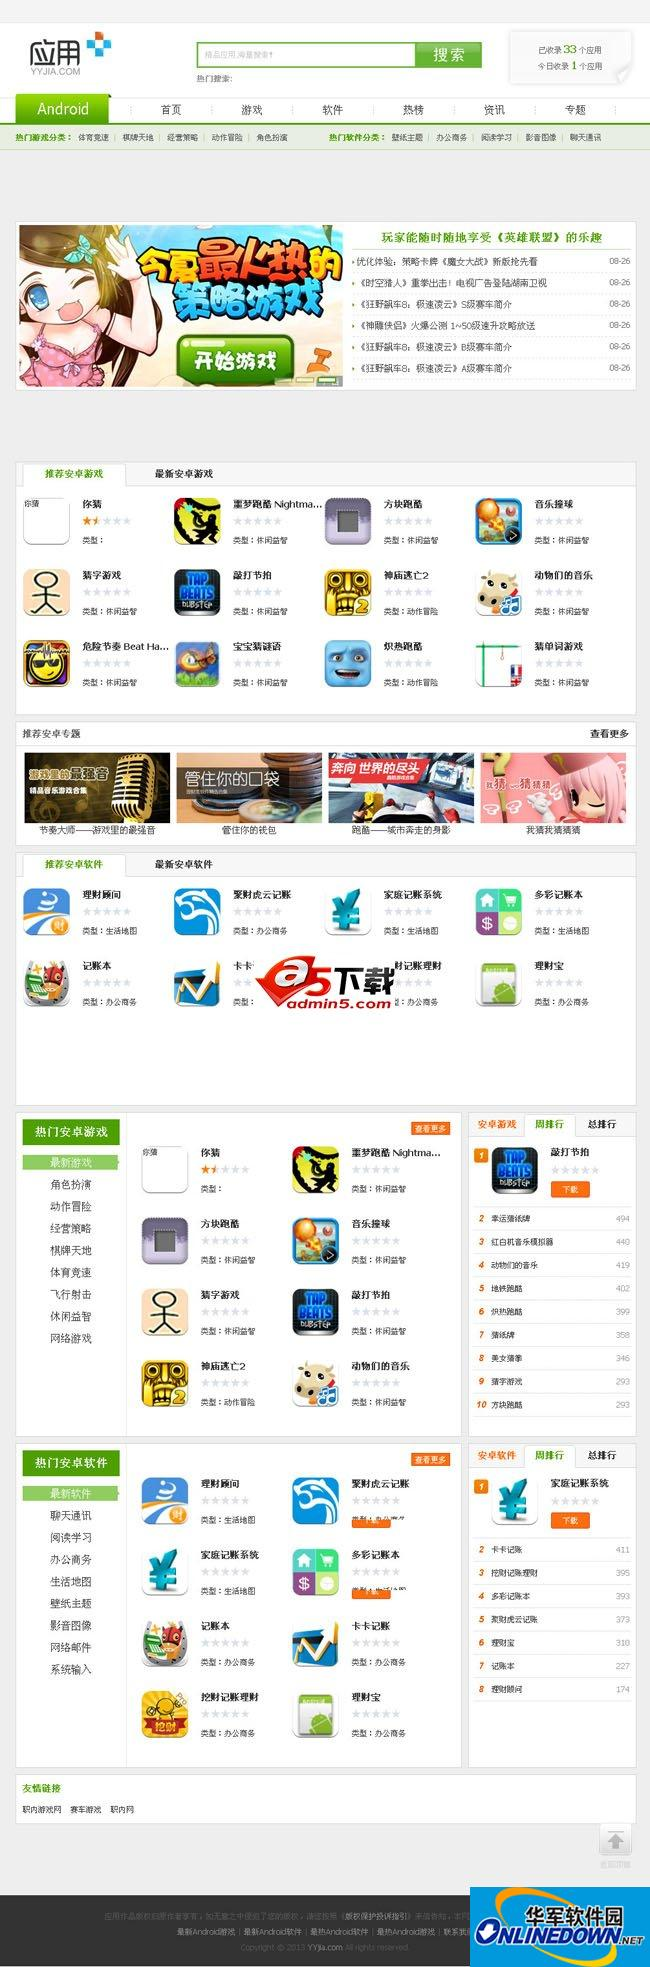 YYjia安卓应用市场网站系统(YYjiaCMS)